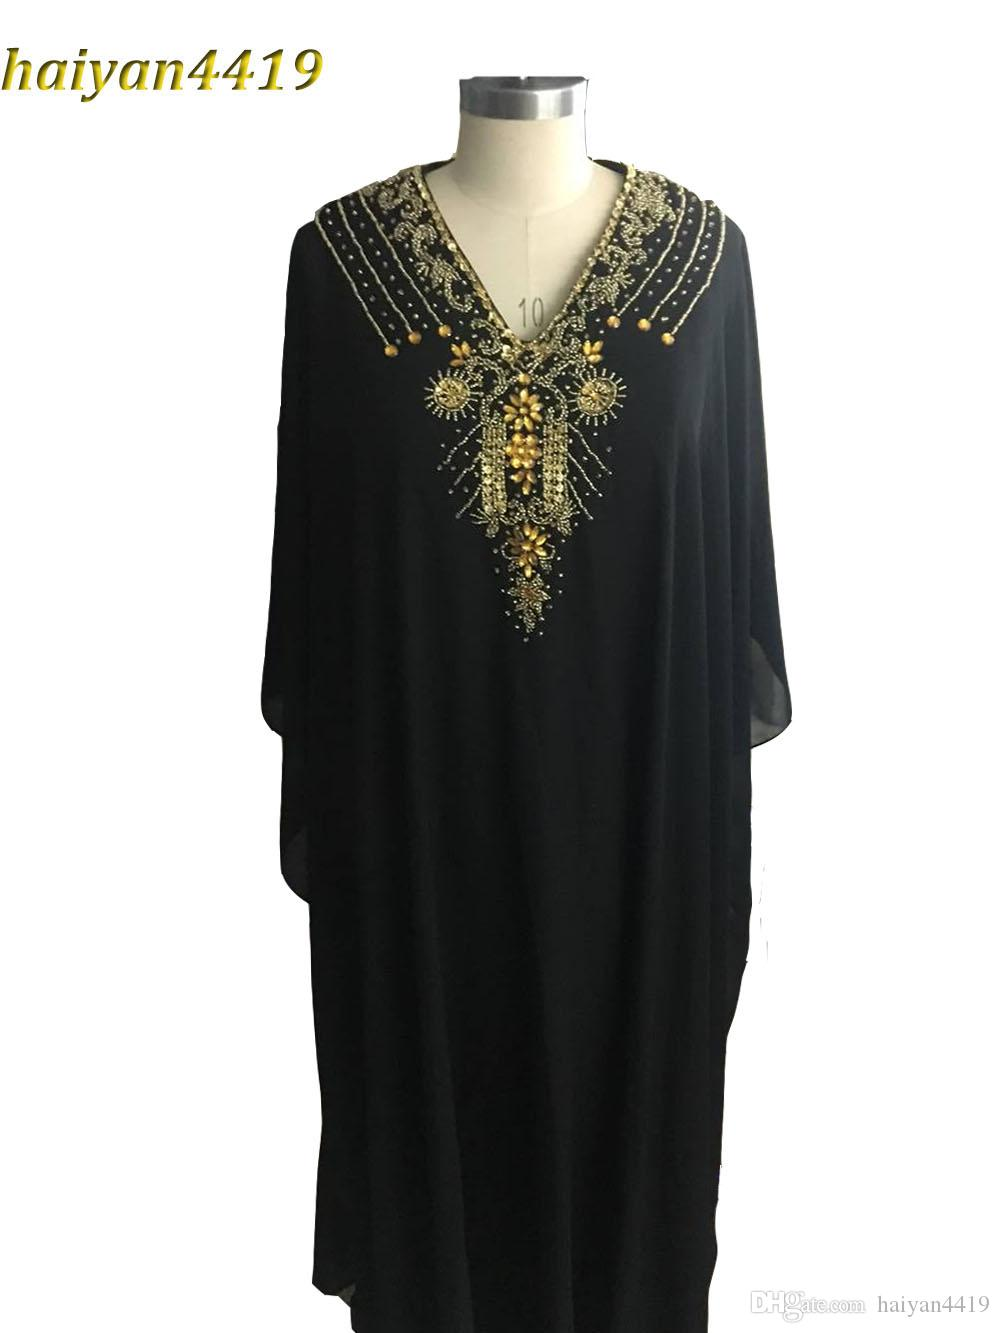 79e0b7b10 Compre 2017 Baratos Largo Árabe Islámica Ropa Para Las Mujeres Abaya En  Dubai Kaftan Árabe Musulmanes Vestidos De Noche V Cuello De Gasa Beads  Party Prom ...